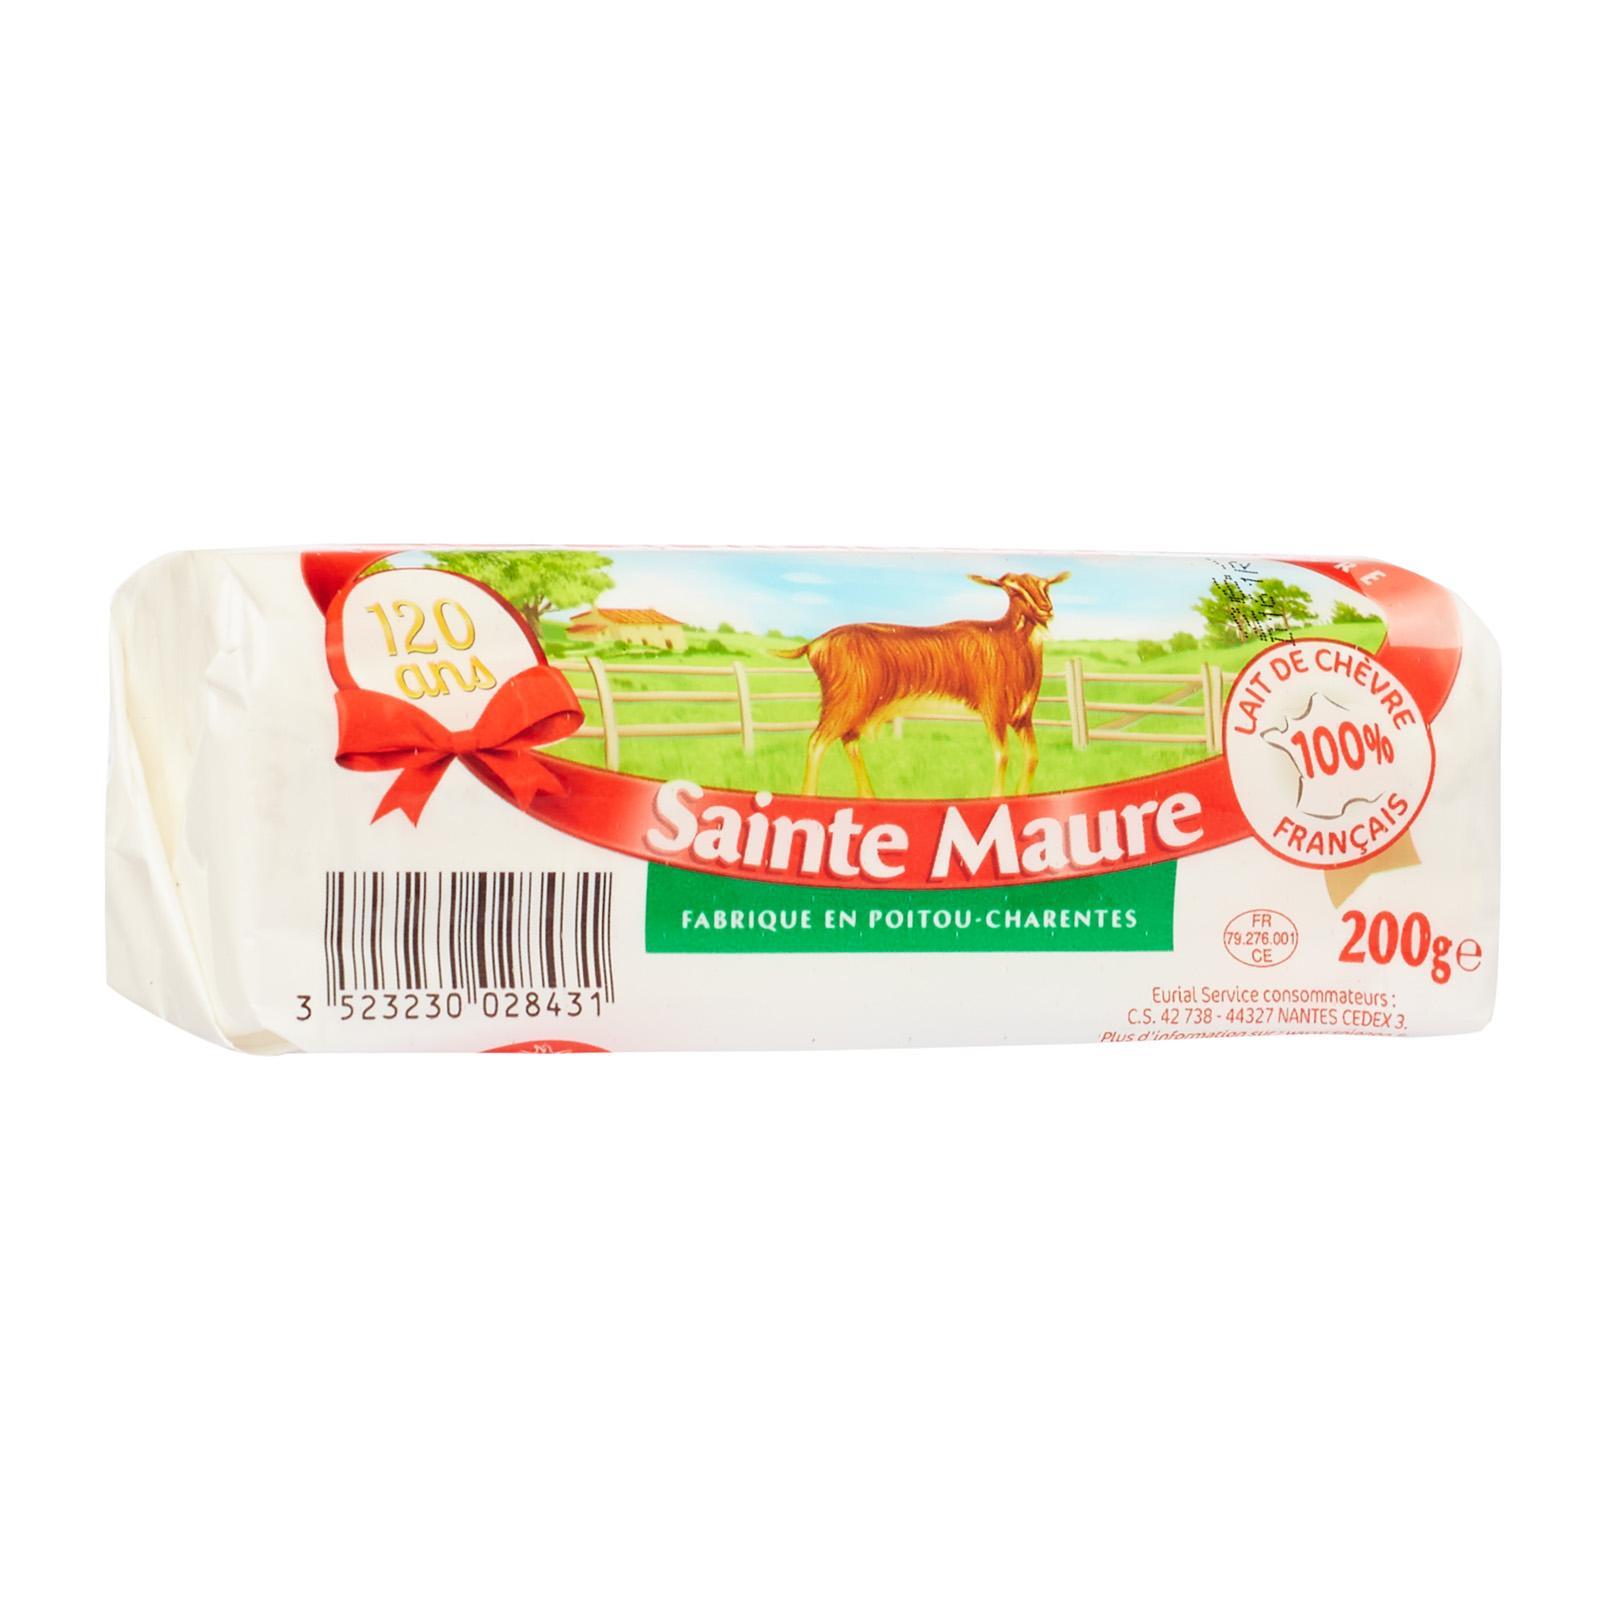 Soignon Sainte Maure Goat Cheese